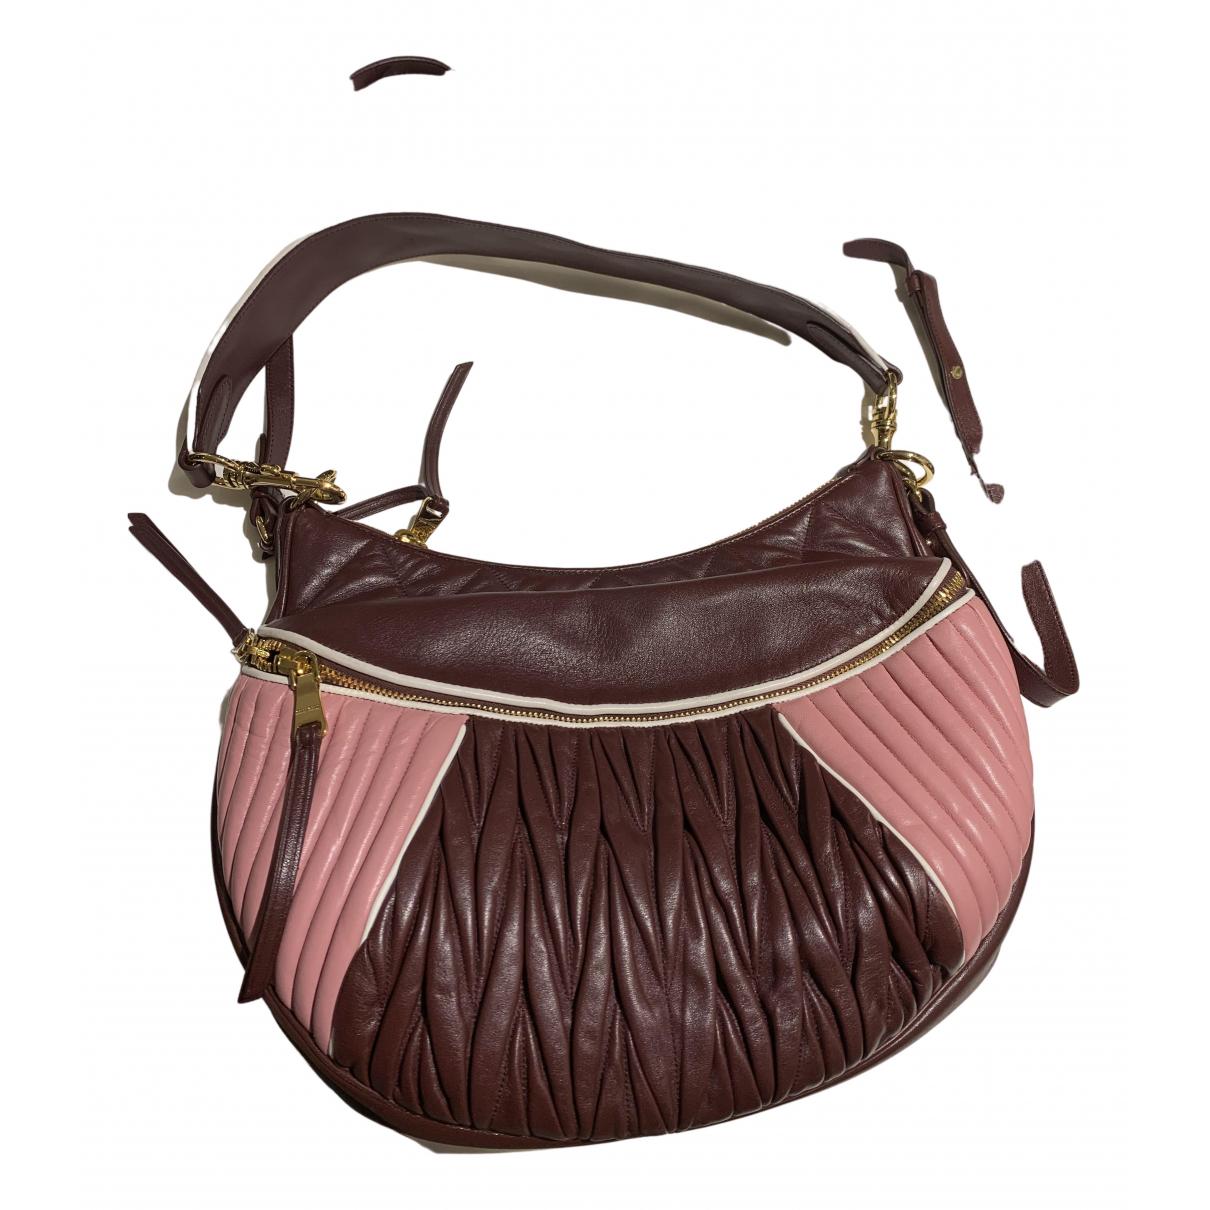 Miu Miu Matelasse Handtasche in  Bordeauxrot Leder